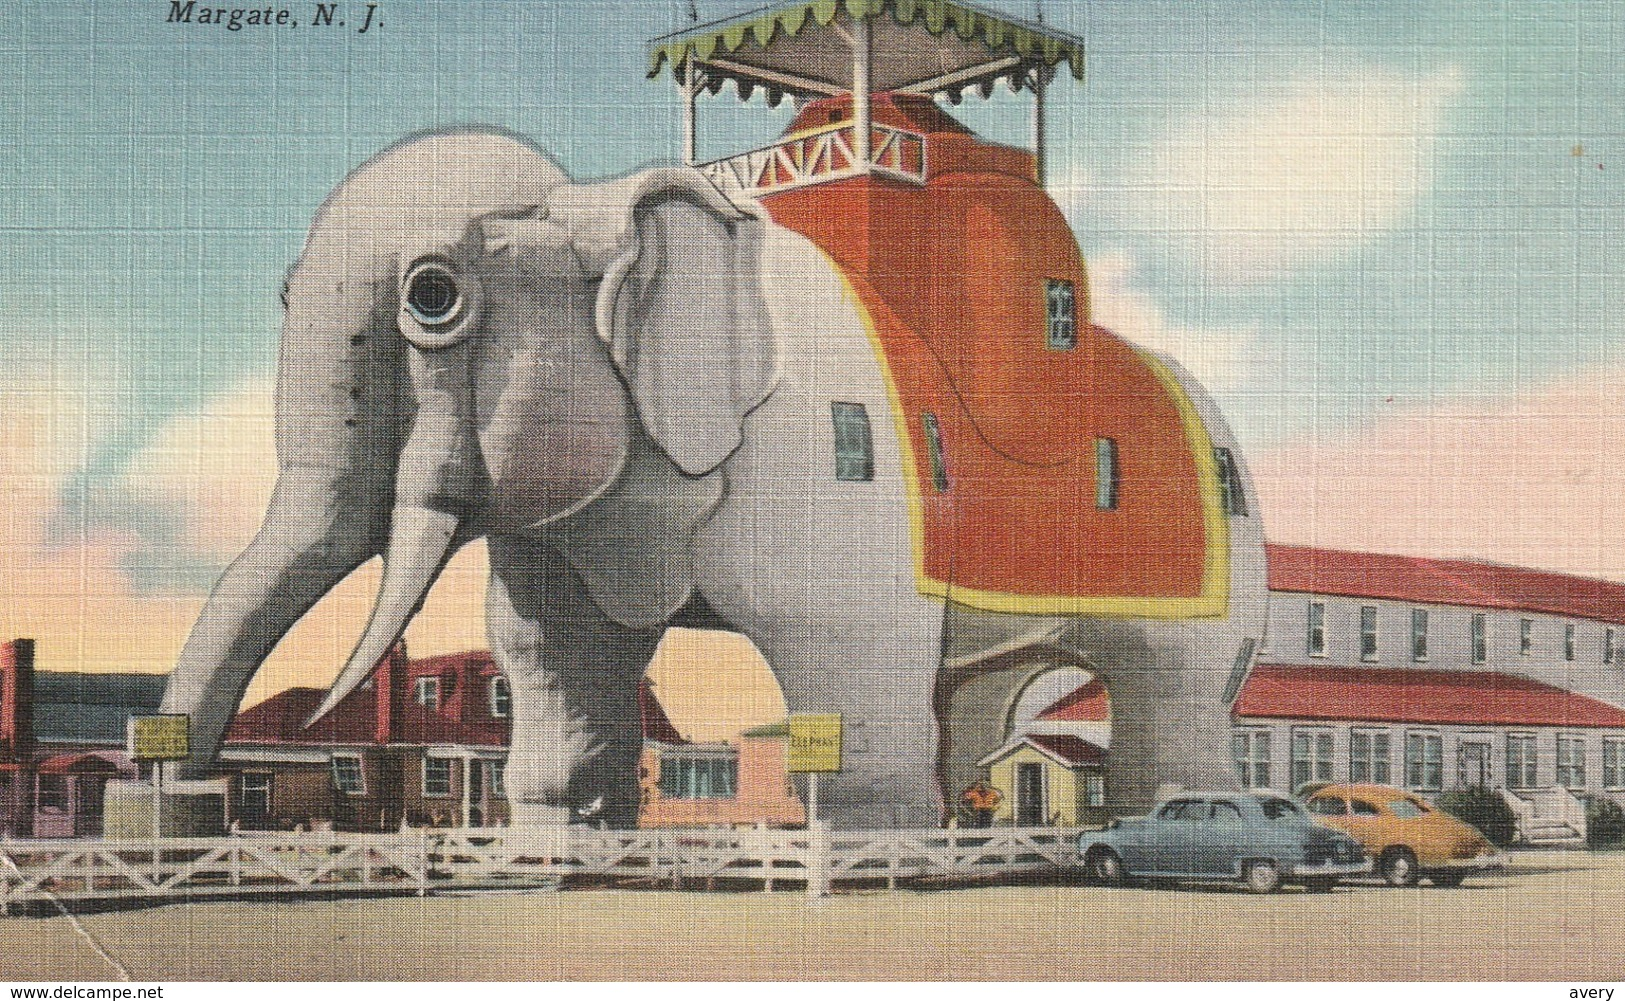 "Elephant Hotel, ""An Old Landmark"", Margate, New Jersey - United States"